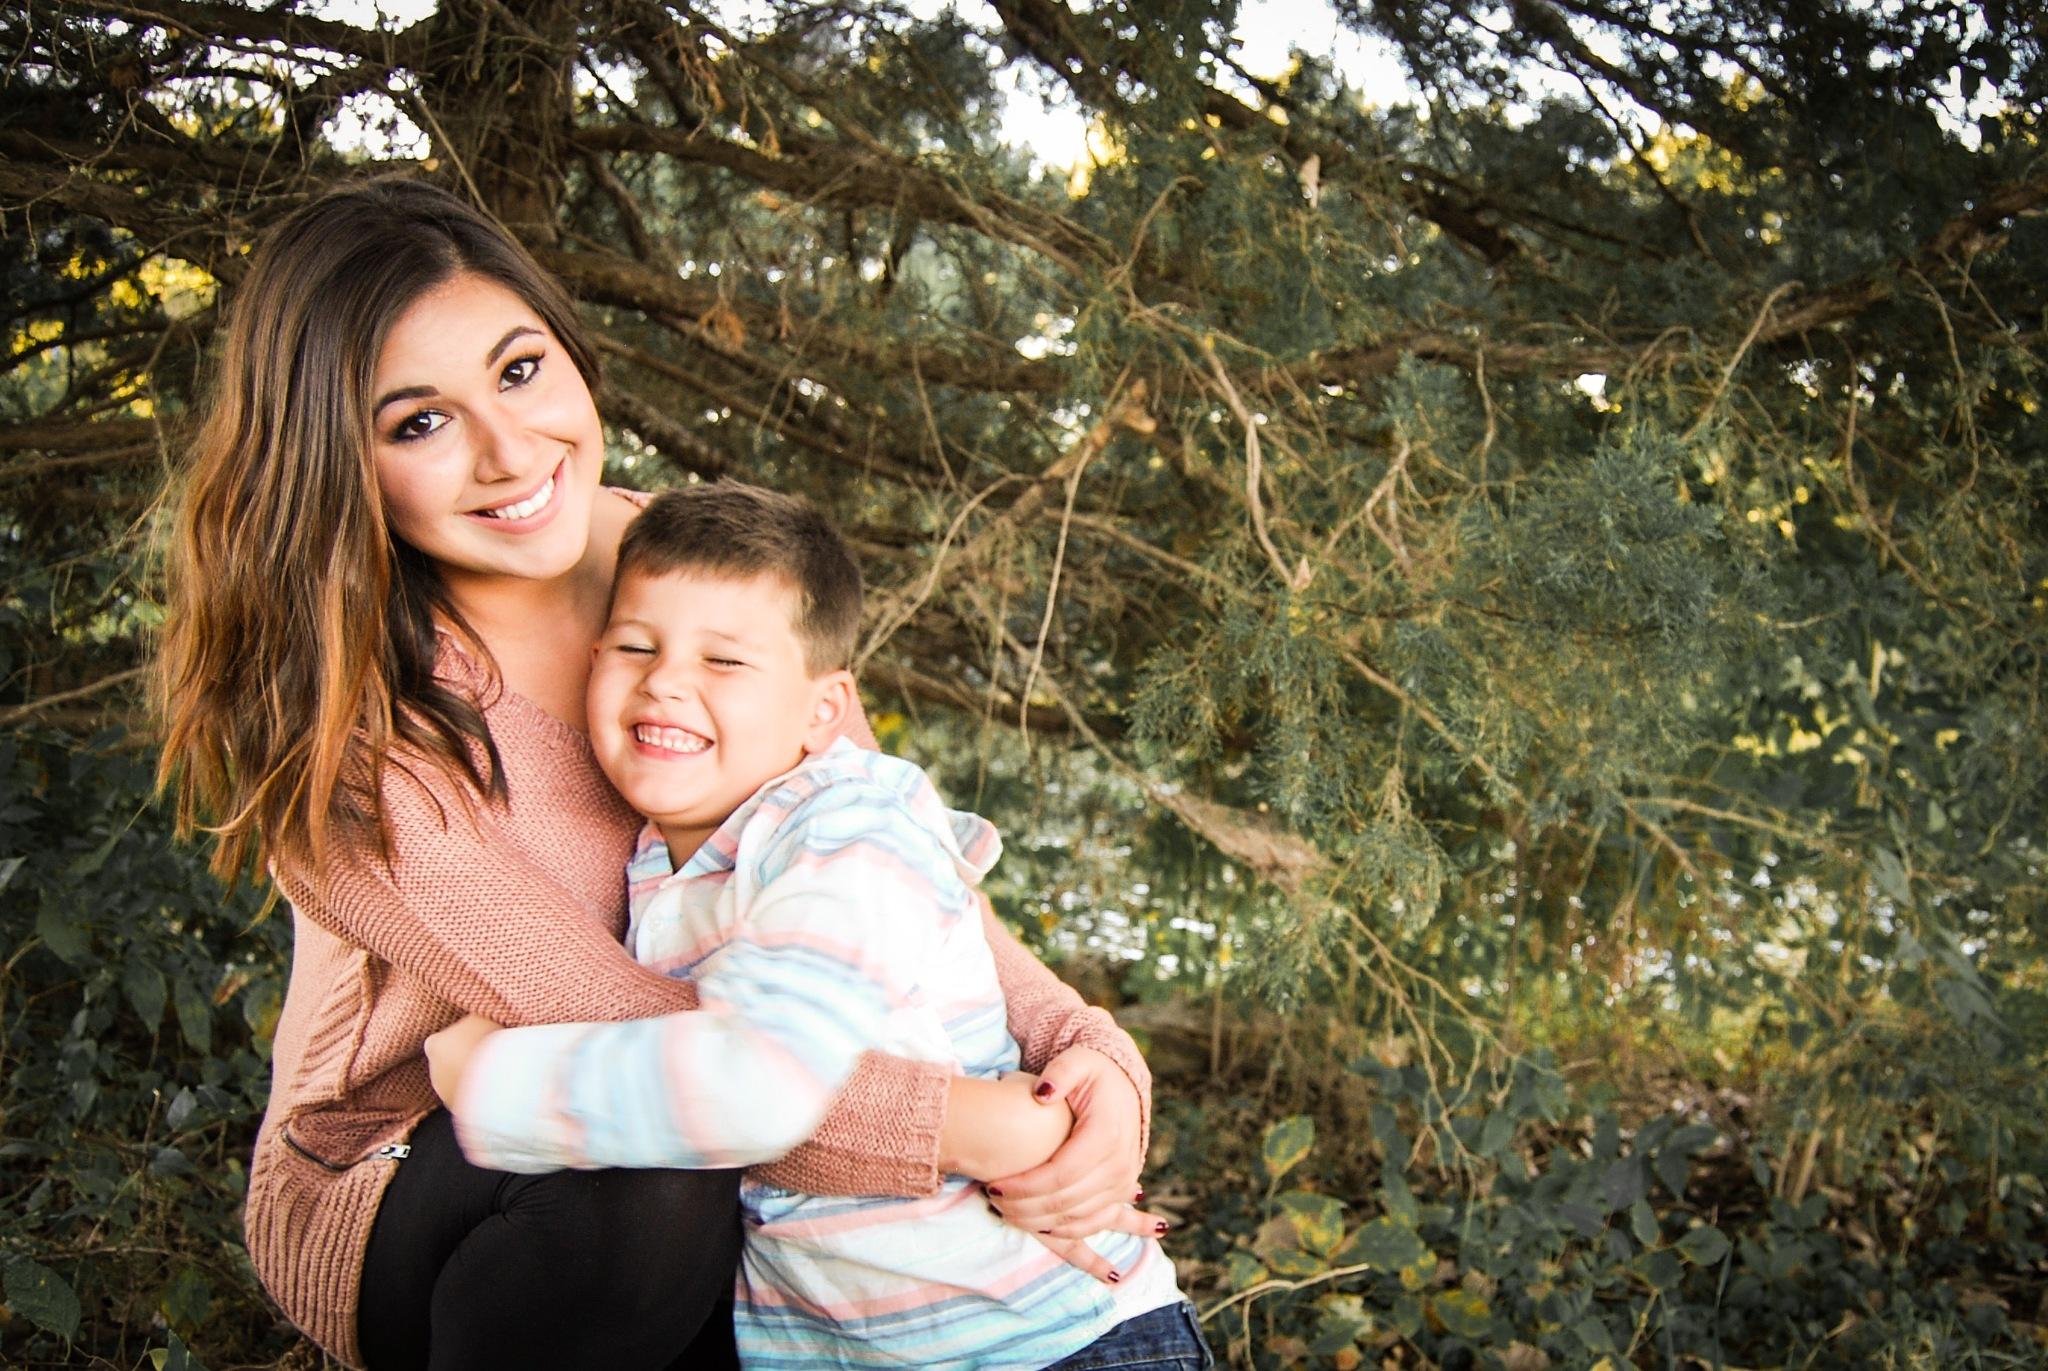 Mom and son by Amy Elizabeth